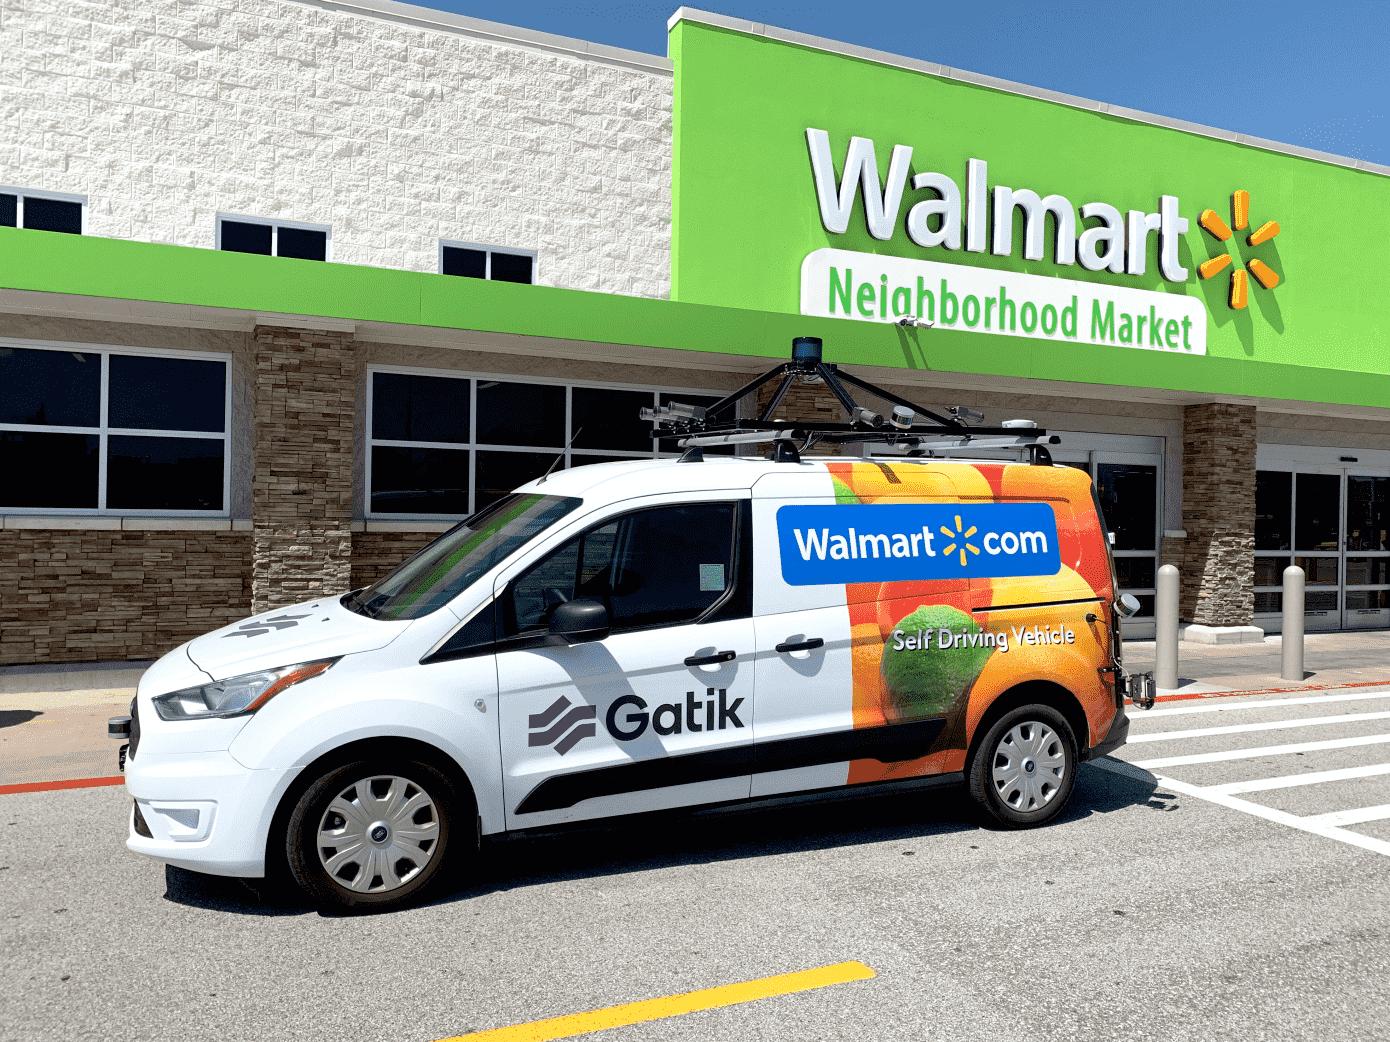 Gatik Announces Walmart Partnership